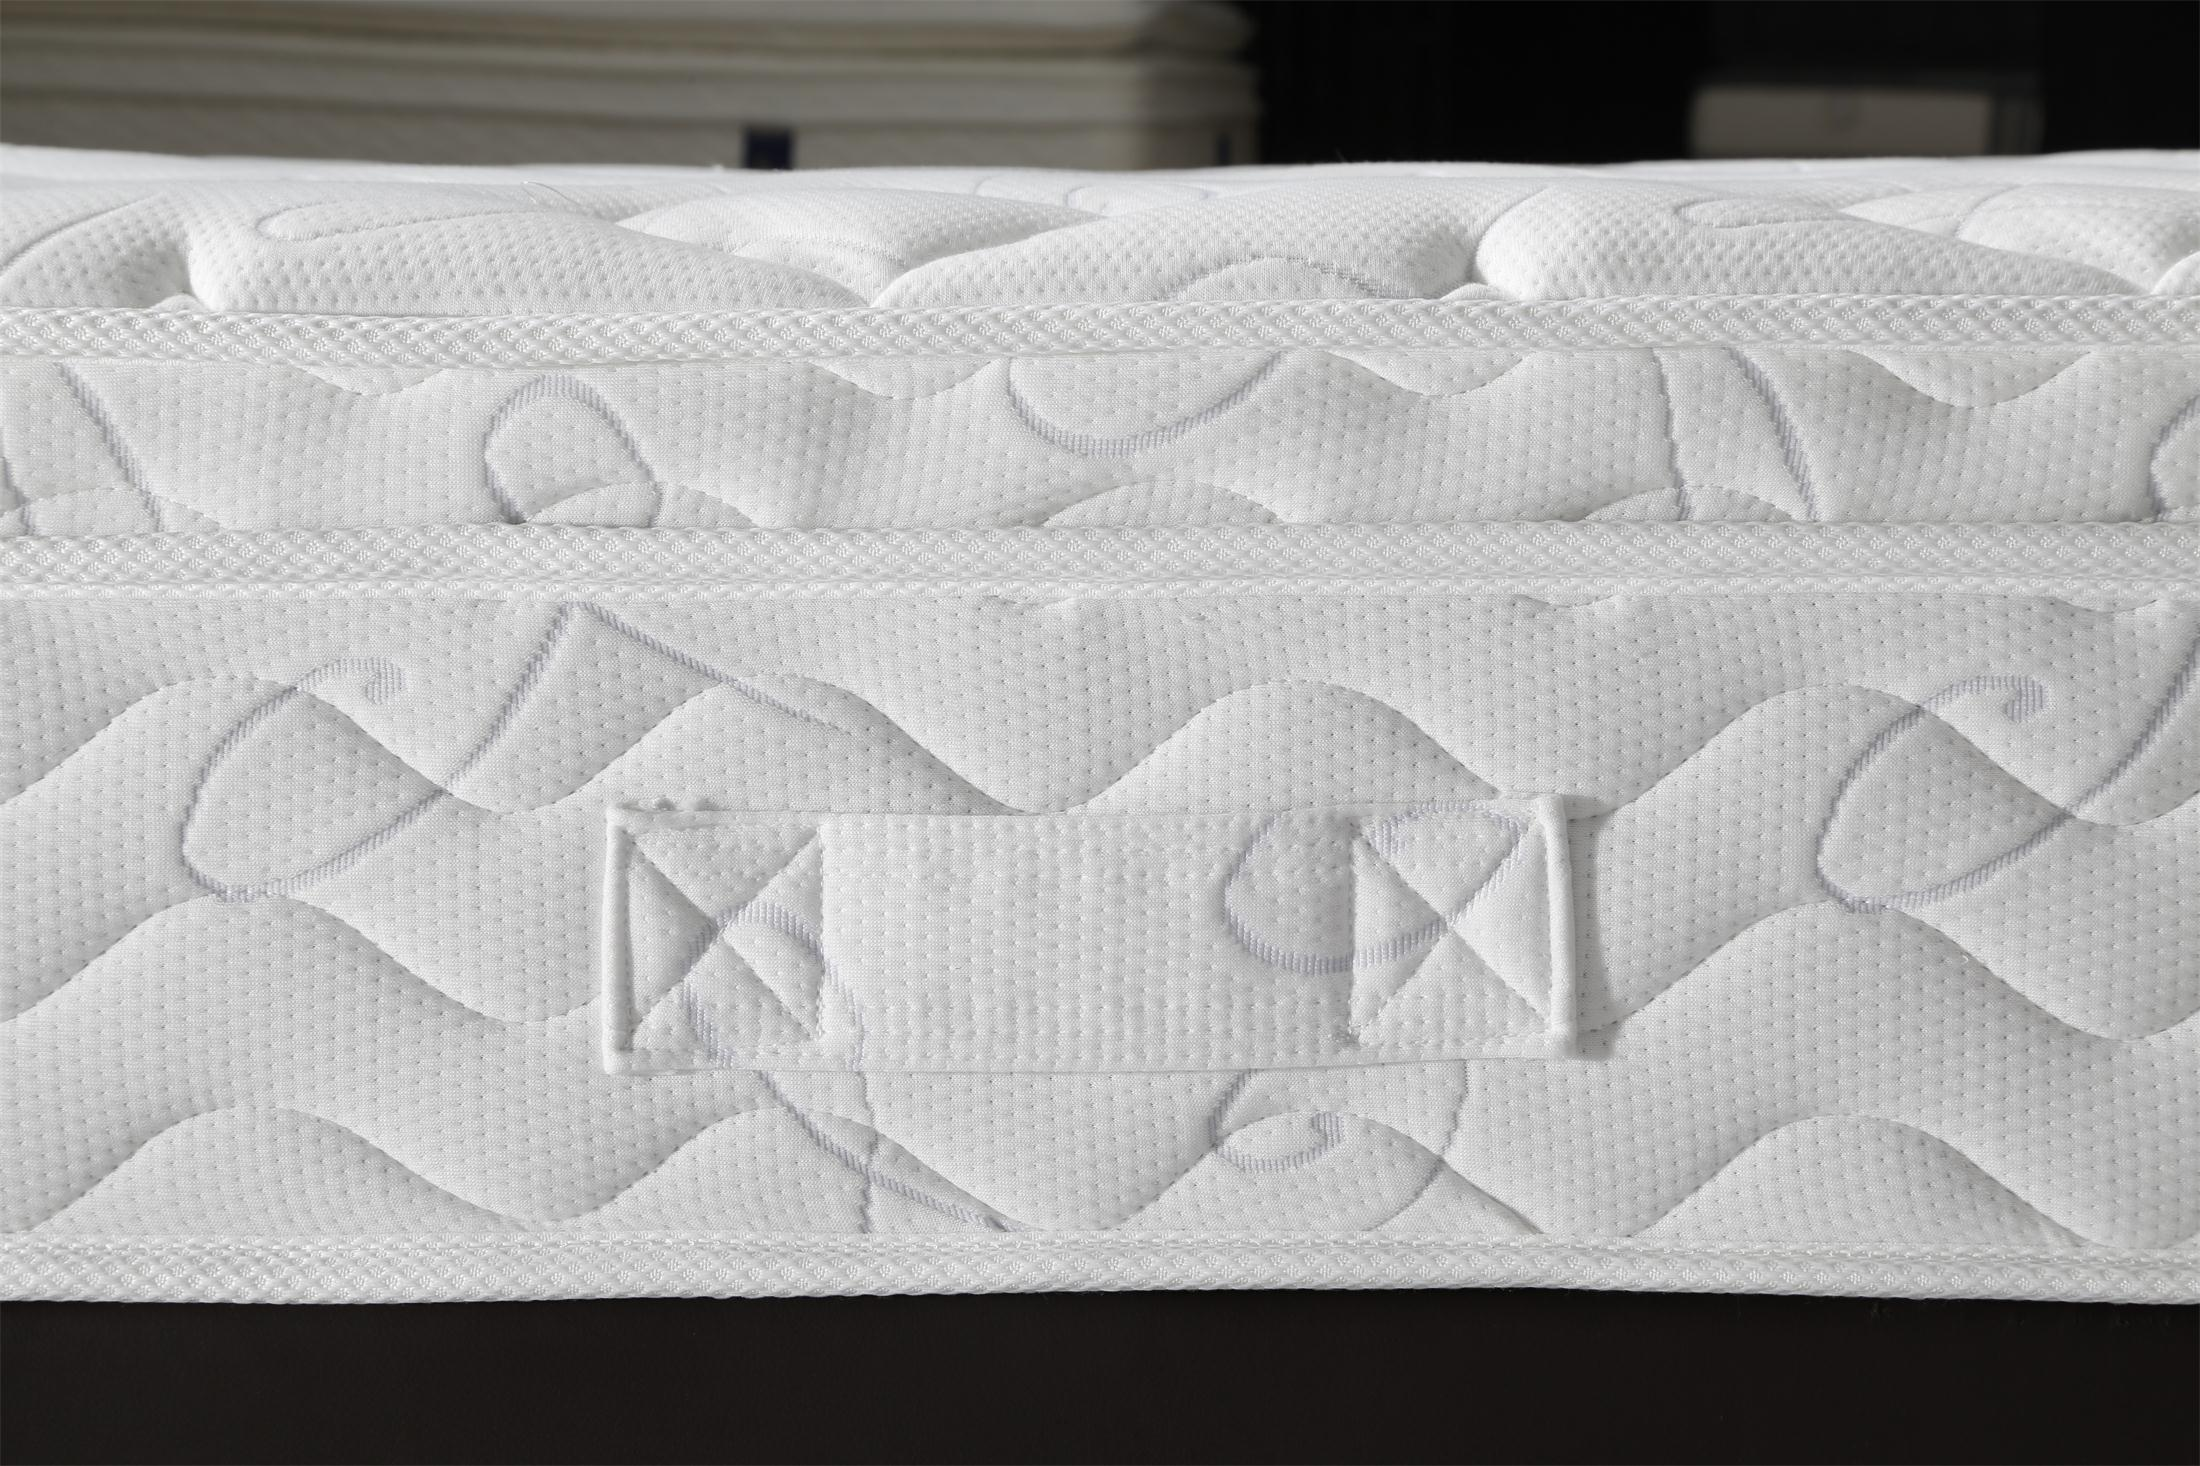 application-JLH special affordable mattress for Home-JLH-img-1